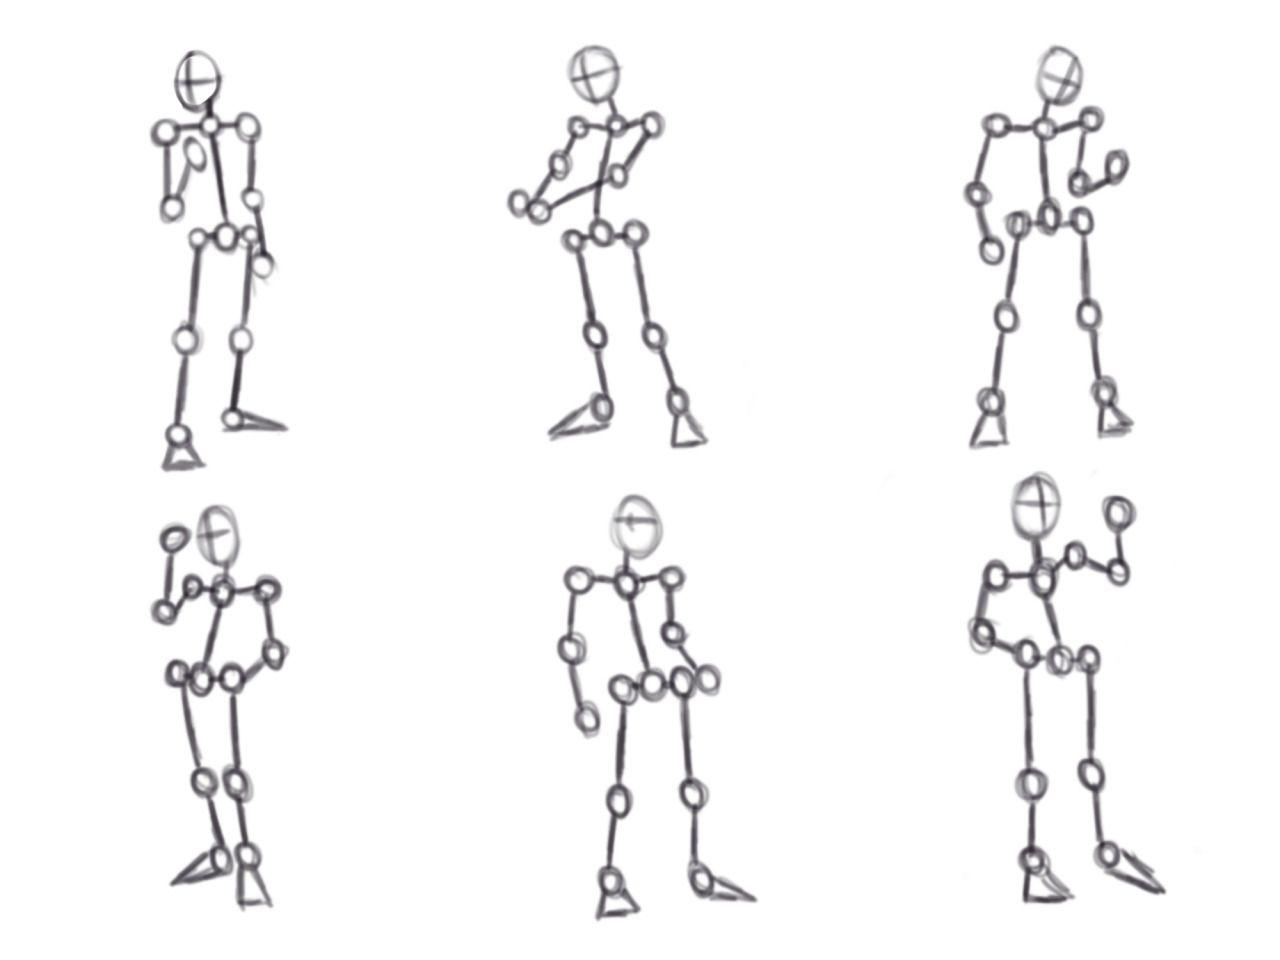 tumblr_nw6ycwUzK41uiwwtio1_1280.jpg 1,280×960 pixels | Drawing ...